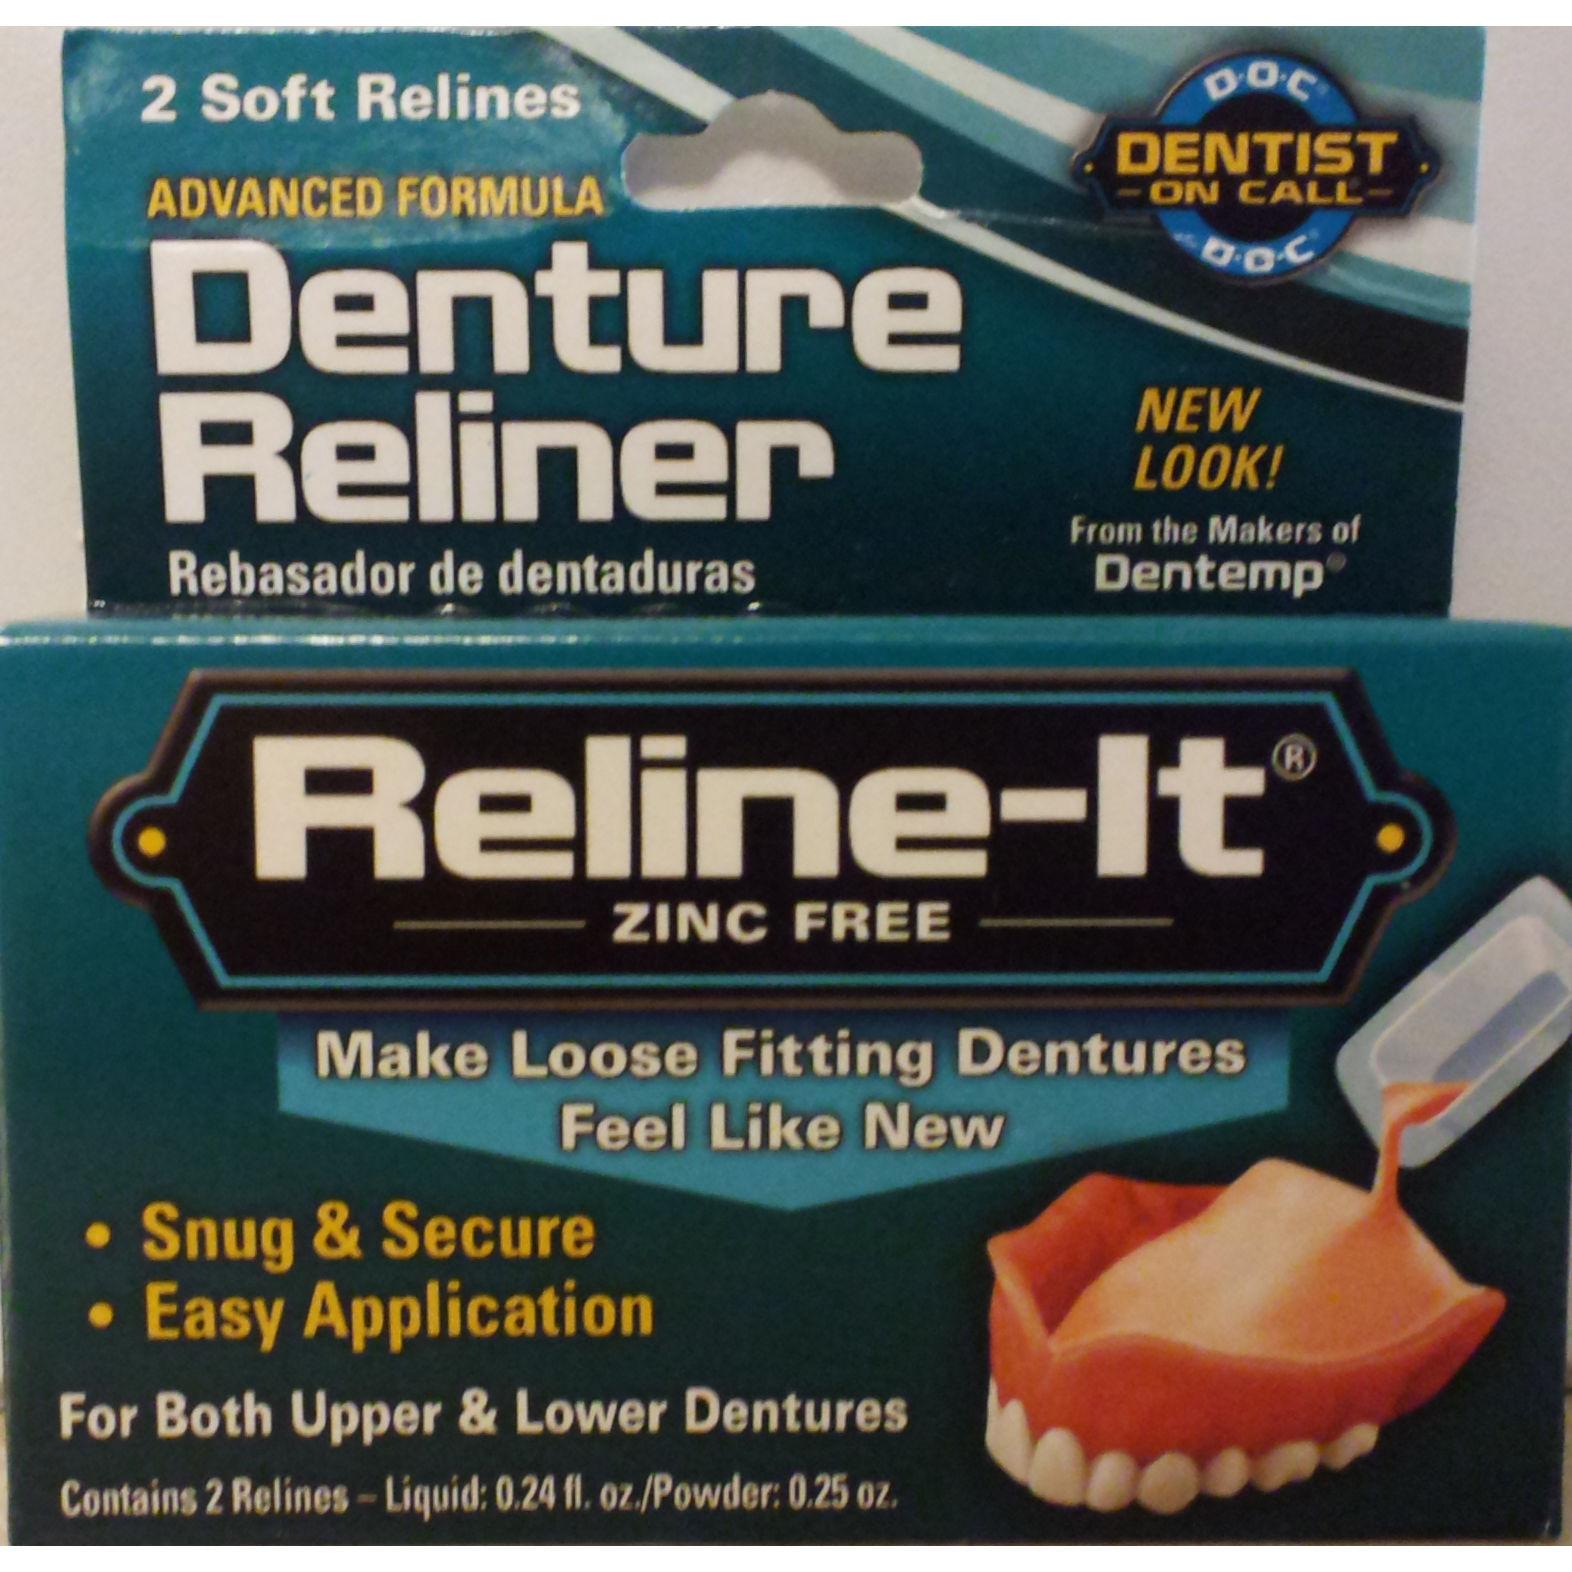 Diy denture reline clublifeglobal diy denture reline clublilobal com solutioingenieria Image collections